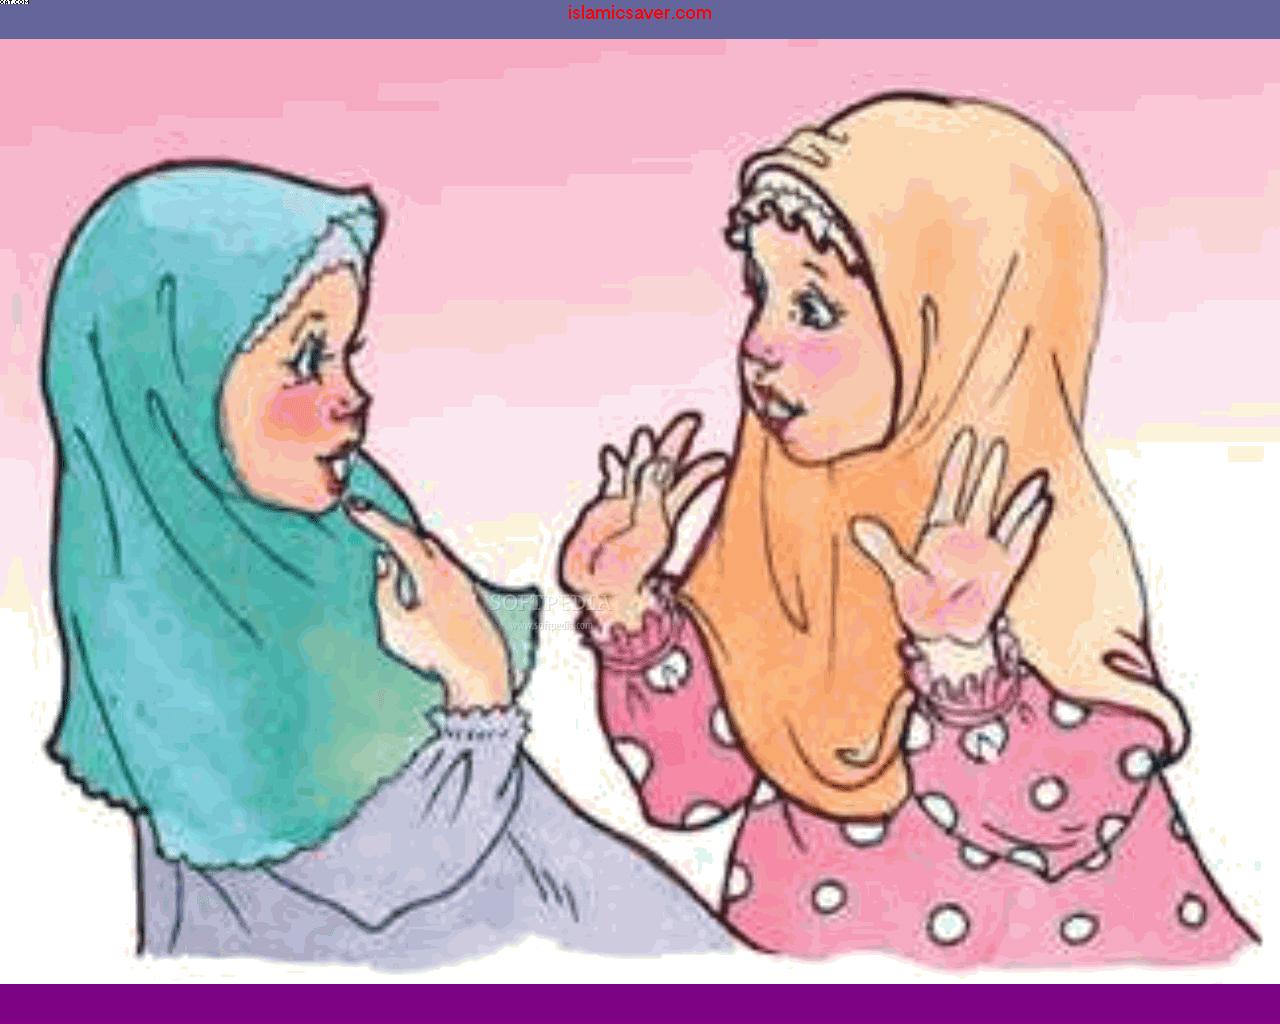 Gambar Kartun Muslimah Dua Orang Gambar Kartun